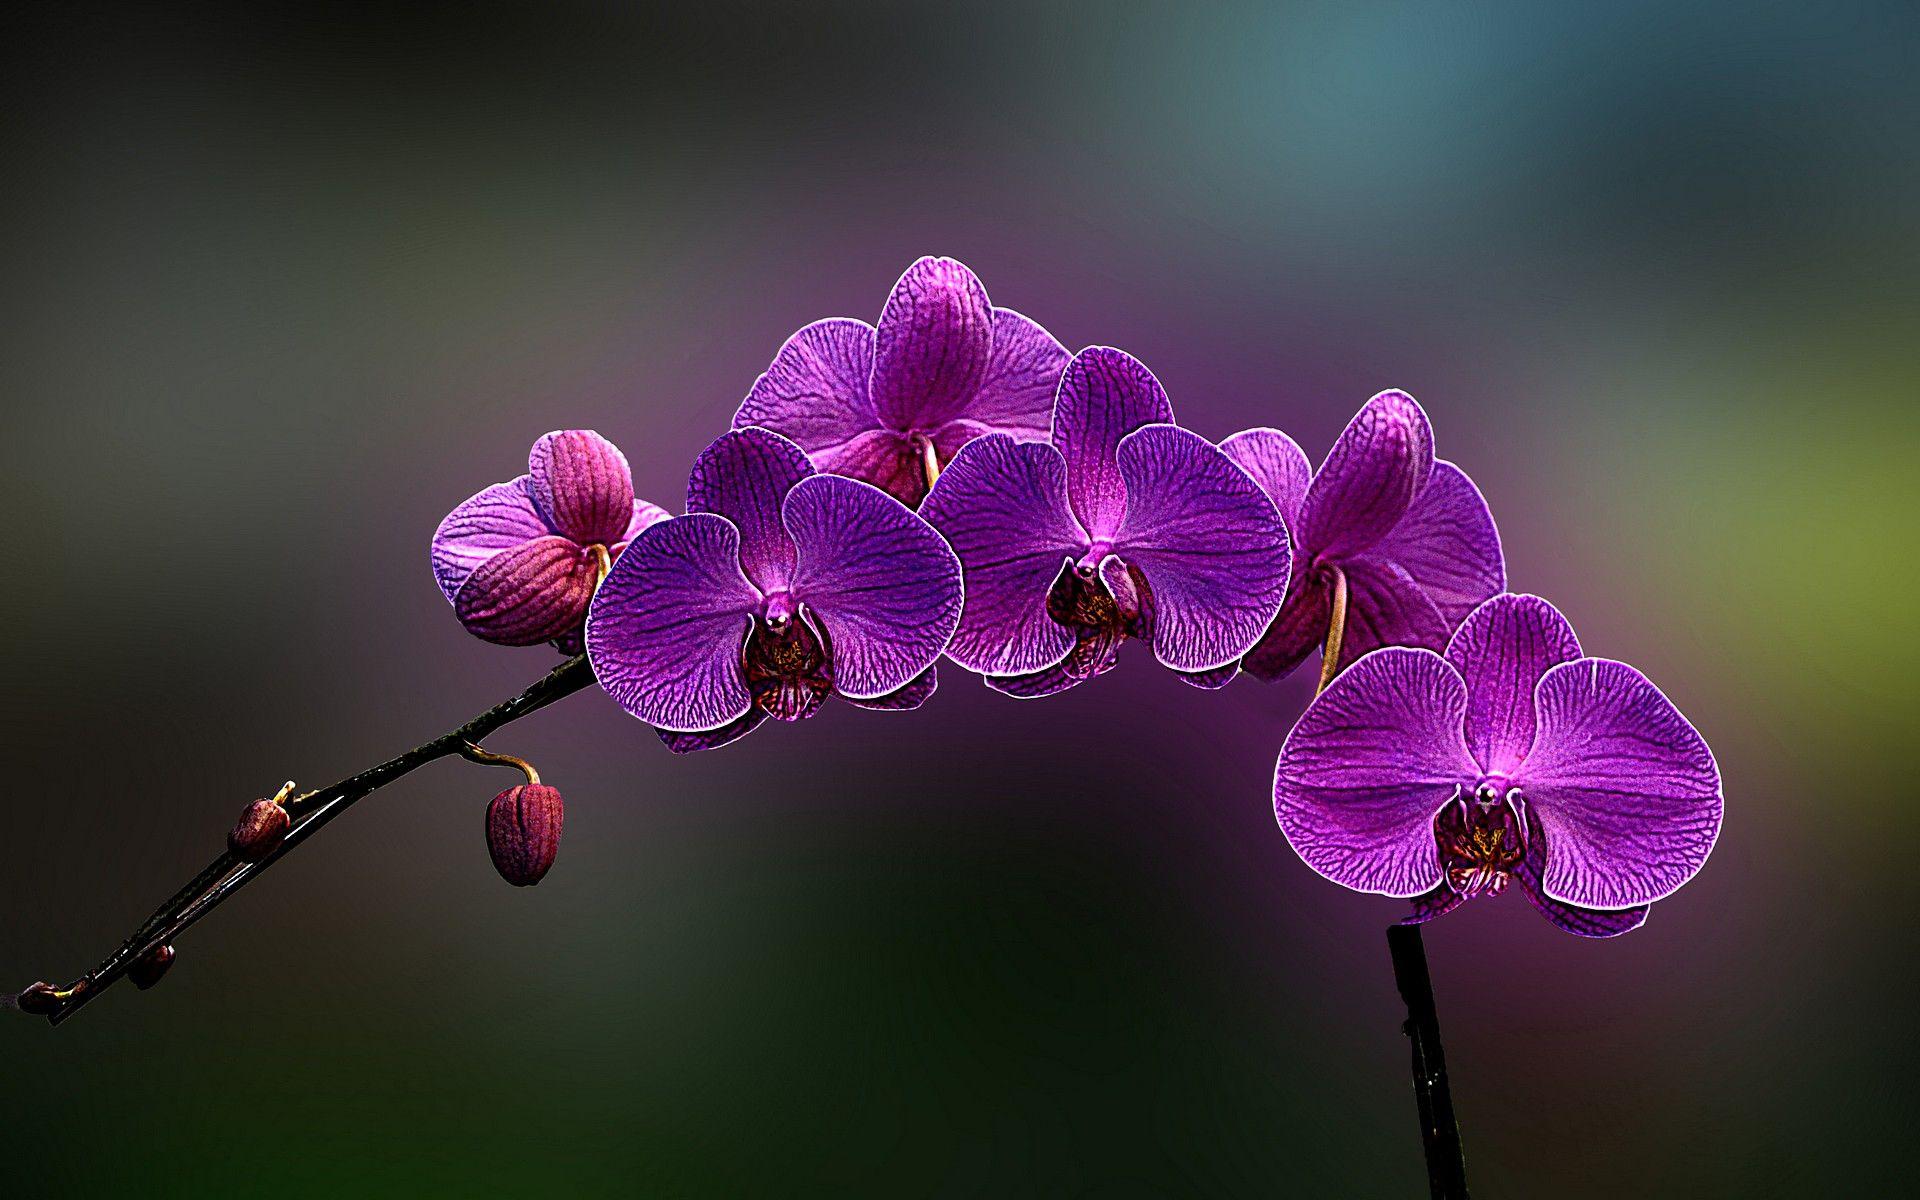 Orchid Flower Flowers Orchids Wallpaper 1920x1200 Flowers Orchids Purple Flowers Orchid Wallpaper Types Of Purple Flowers Purple Orchids